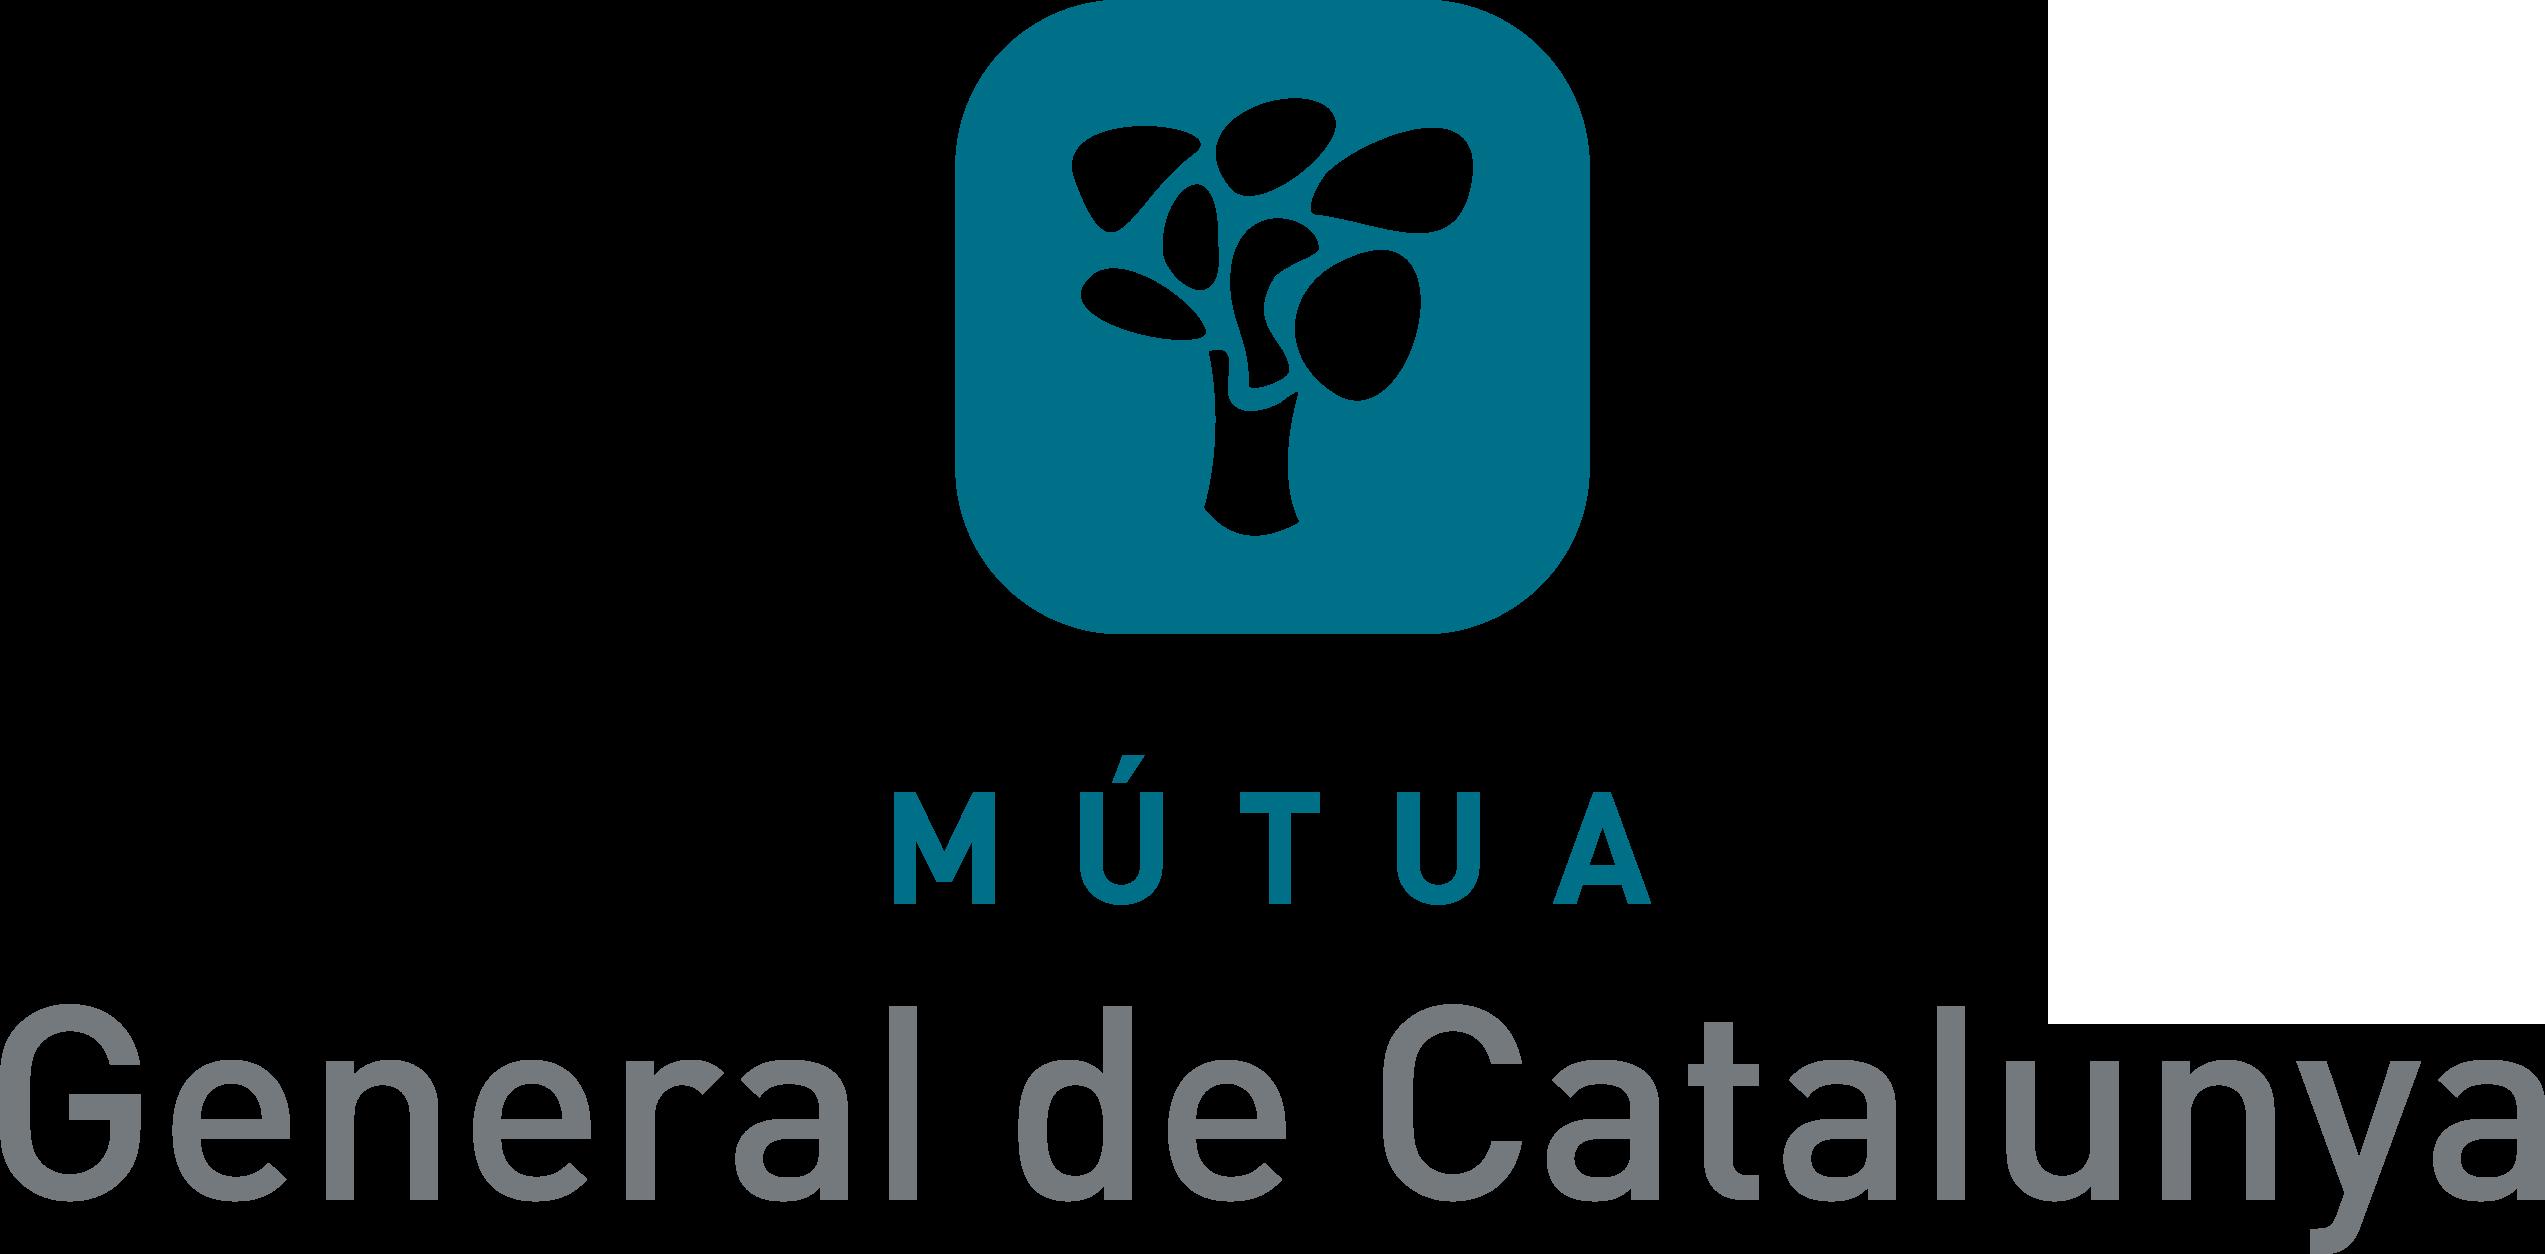 mutua-general-de-catalunya-logo